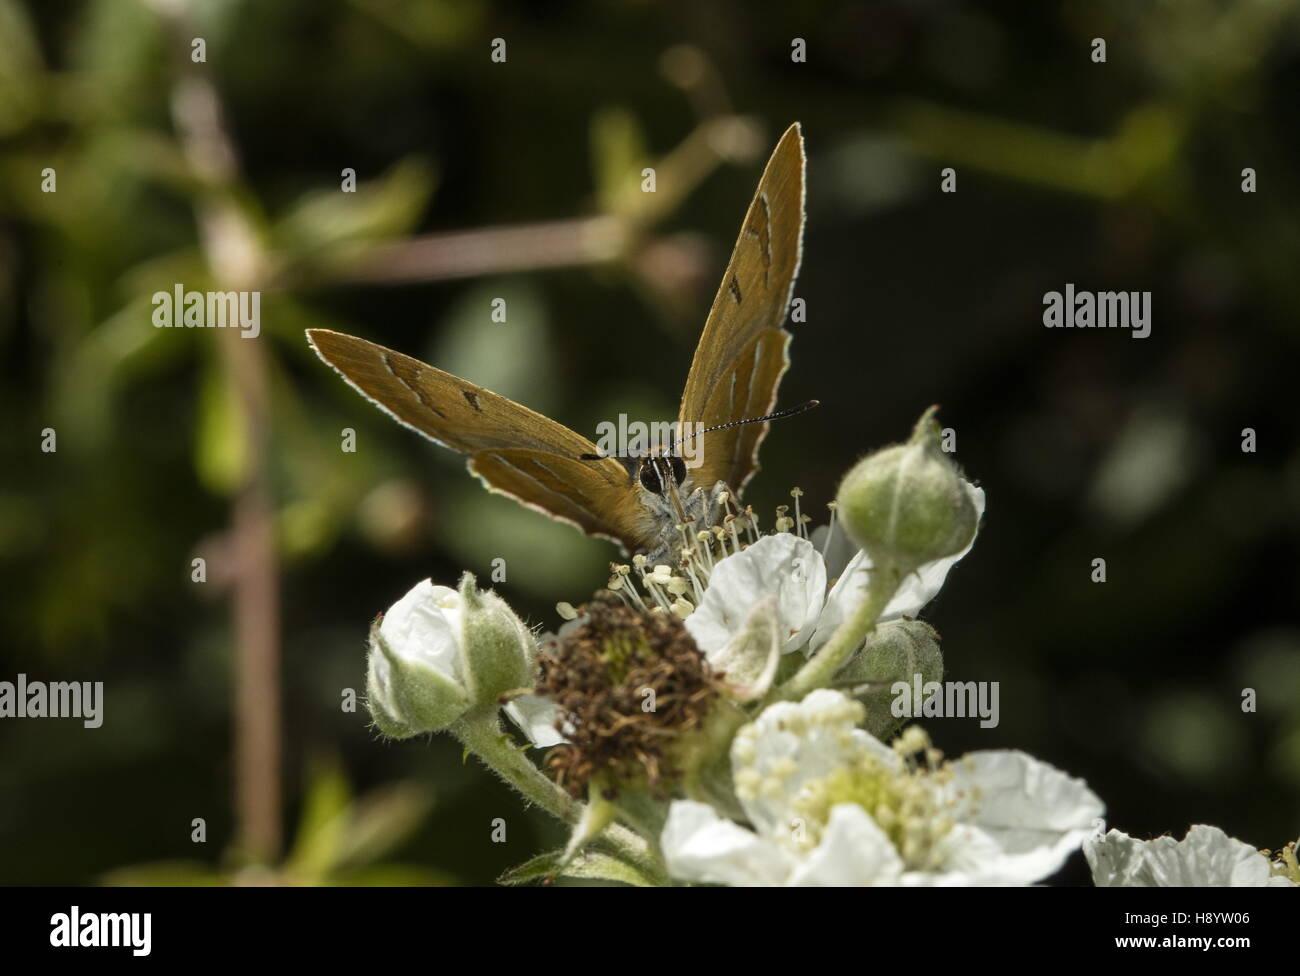 Brown Hairstreak butterfly, Thecla betulae feeding on Bramble blossom - Stock Image